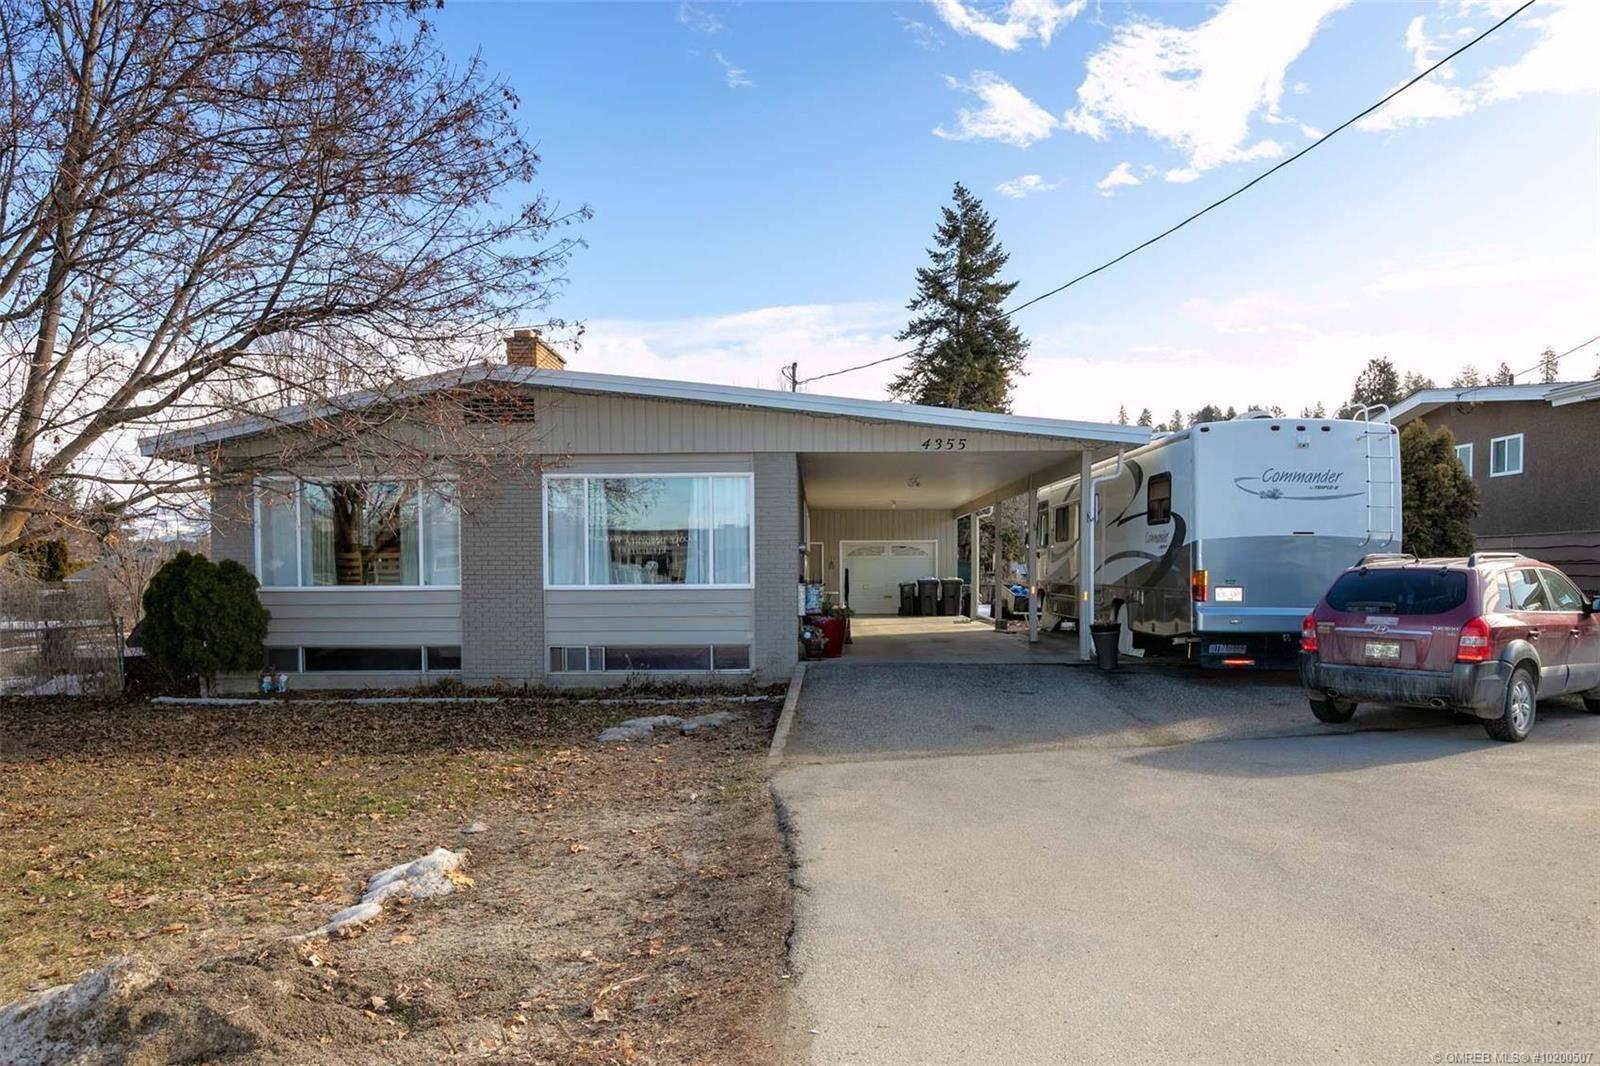 House for sale at 4355 Gordon Dr Kelowna British Columbia - MLS: 10200507